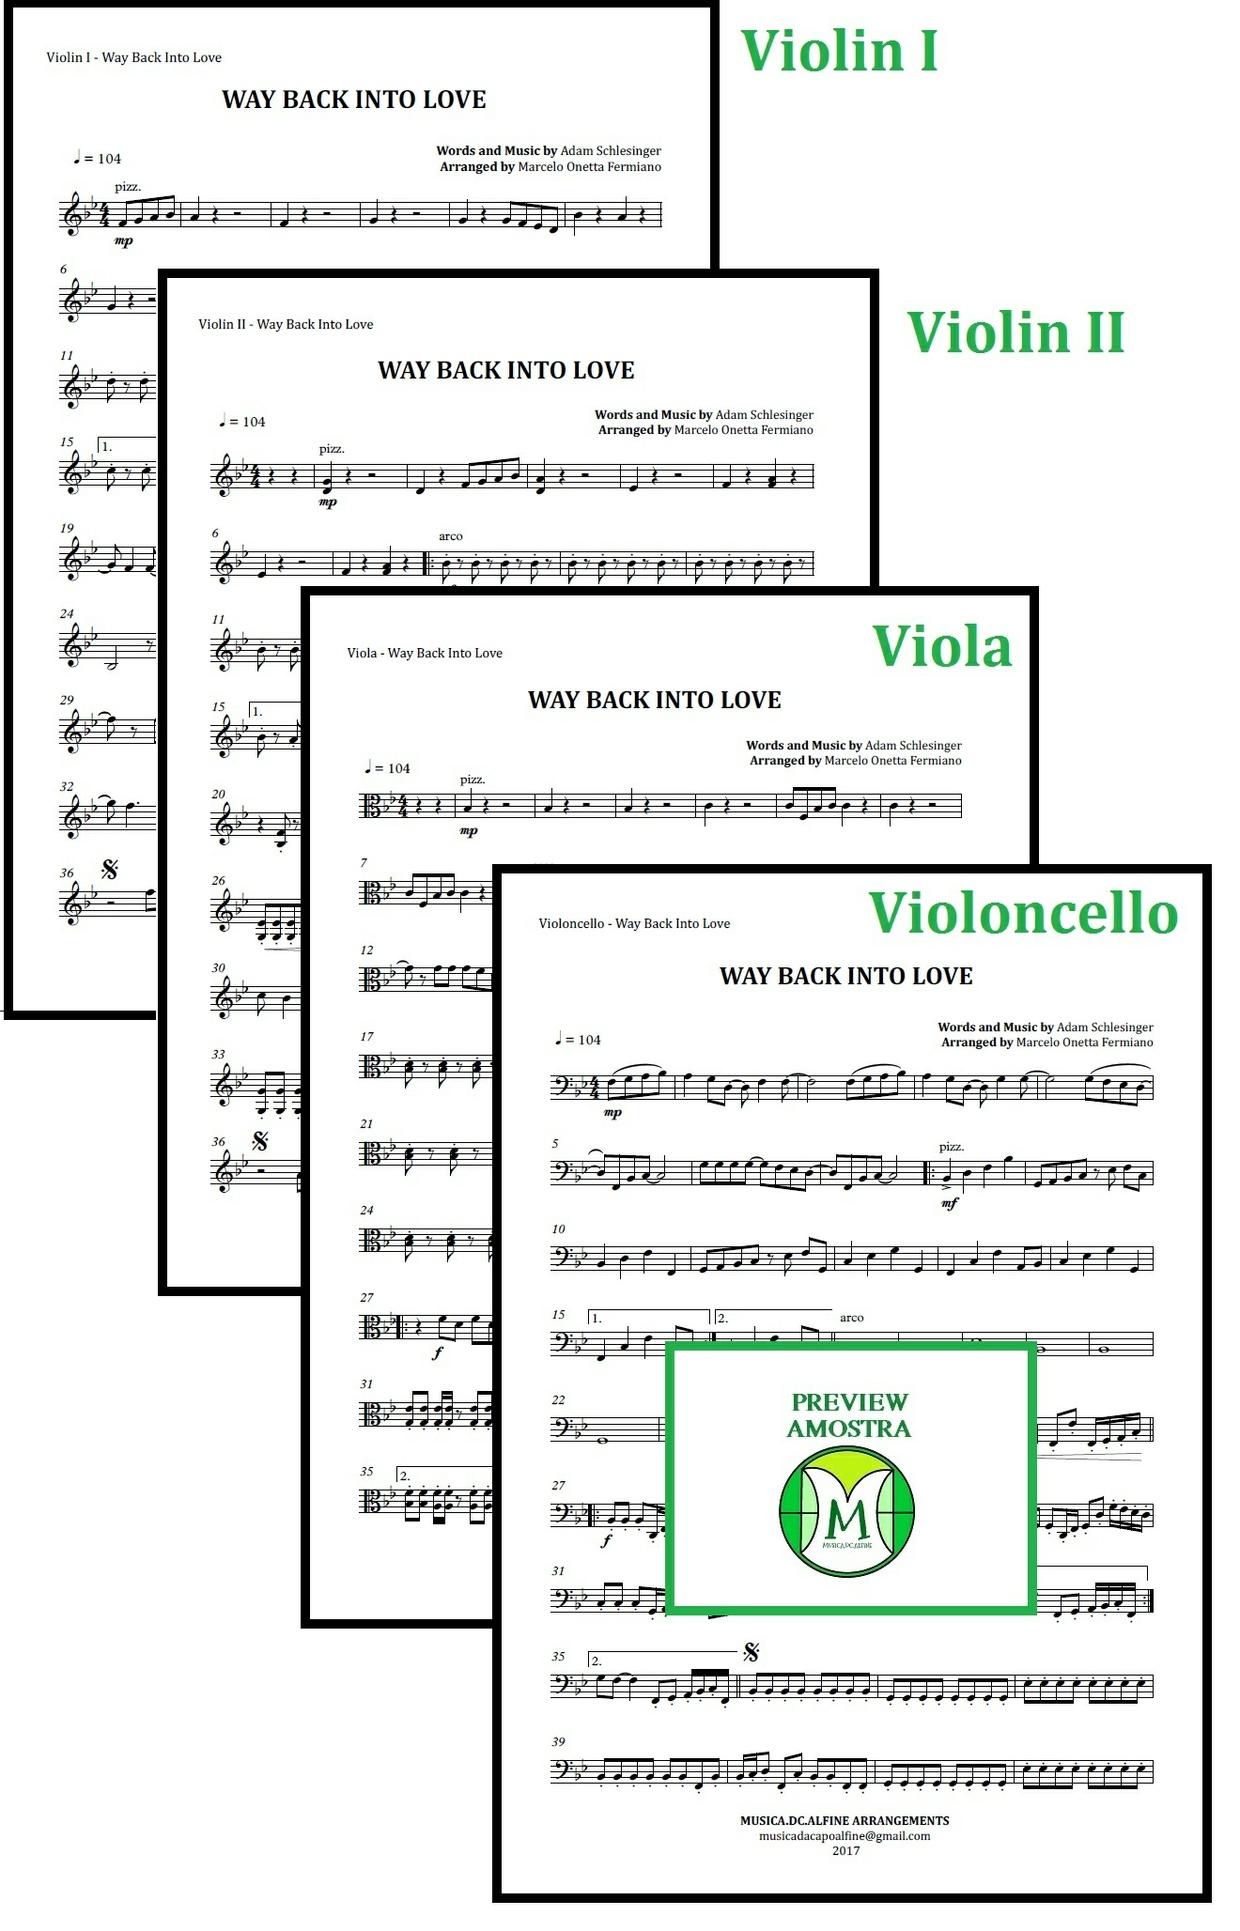 Way Back Into Love | Janice Vidal | Quarteto de Cordas | Partitura Completa Download